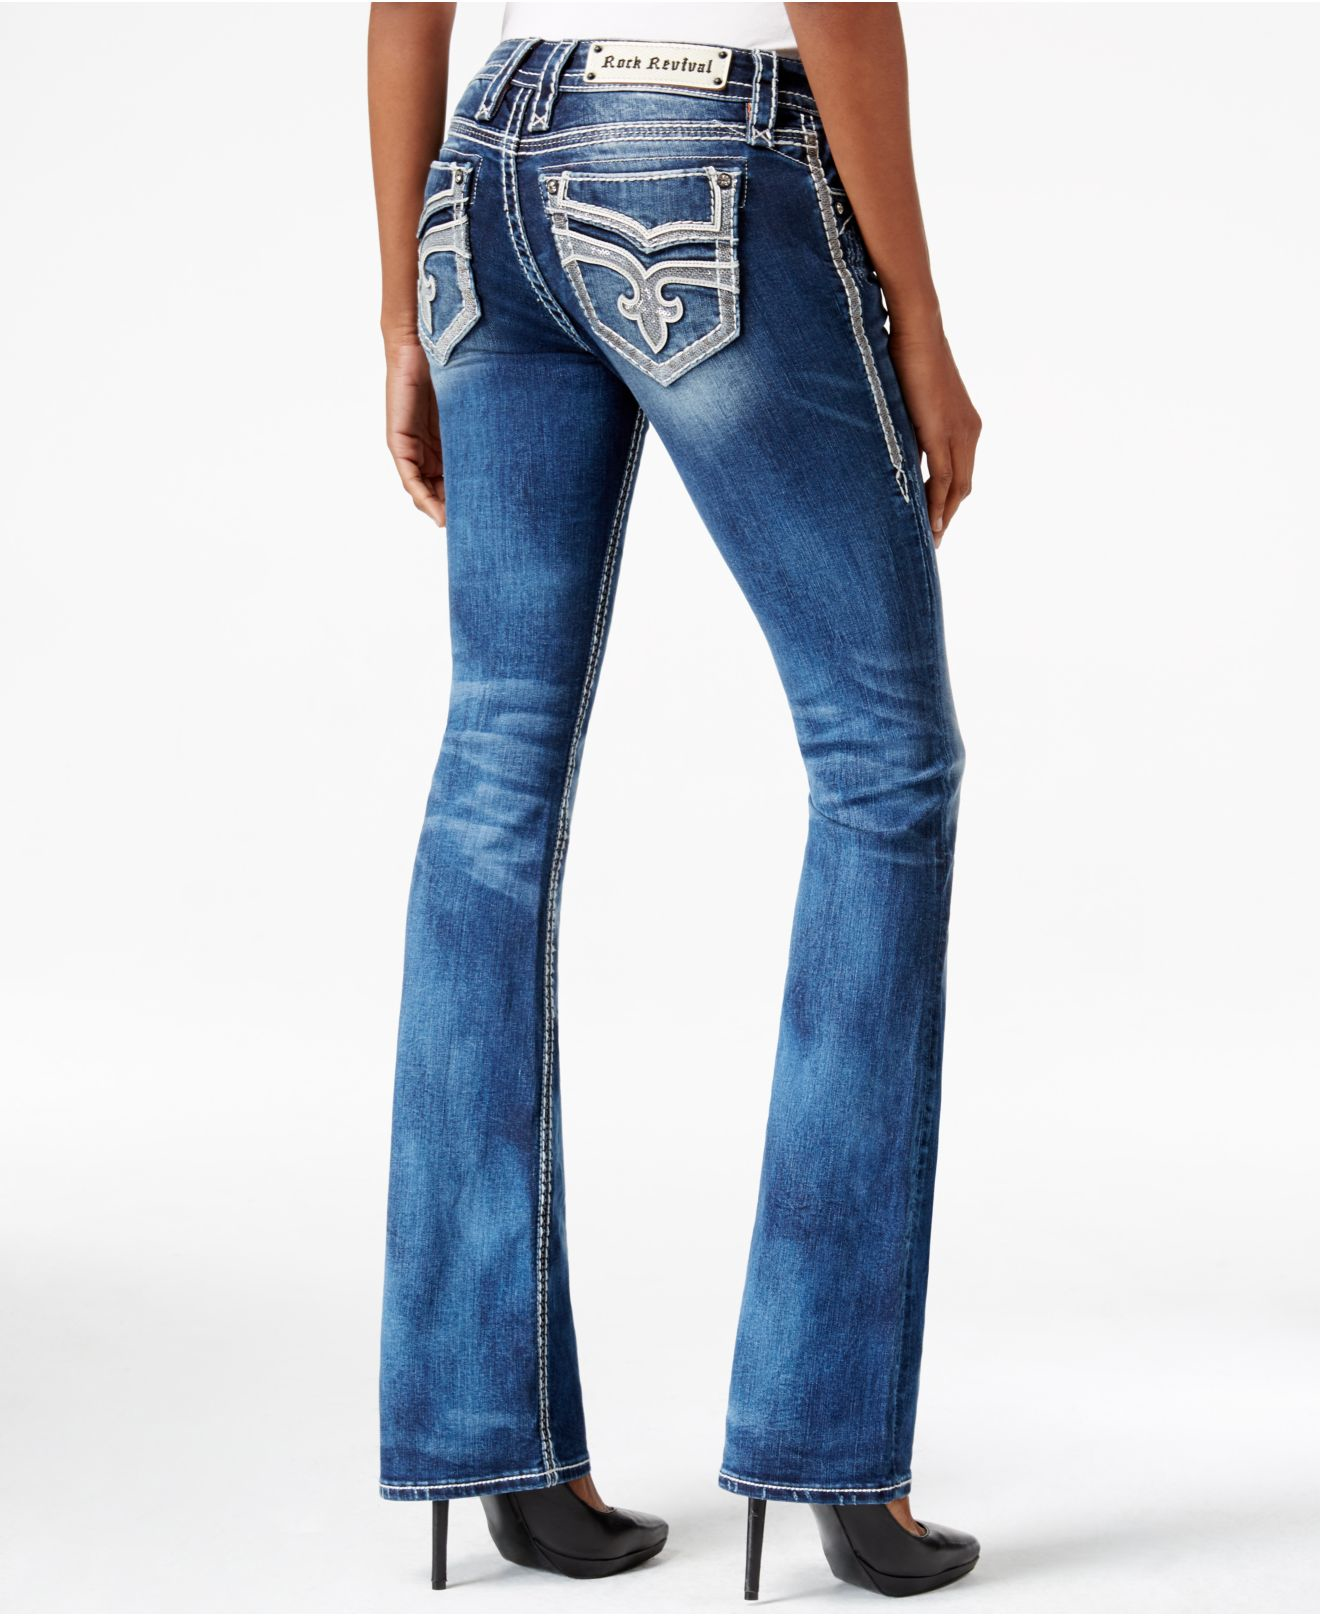 Lyst - Rock Revival Vika Bootcut Medium Blue Wash Jeans in ...